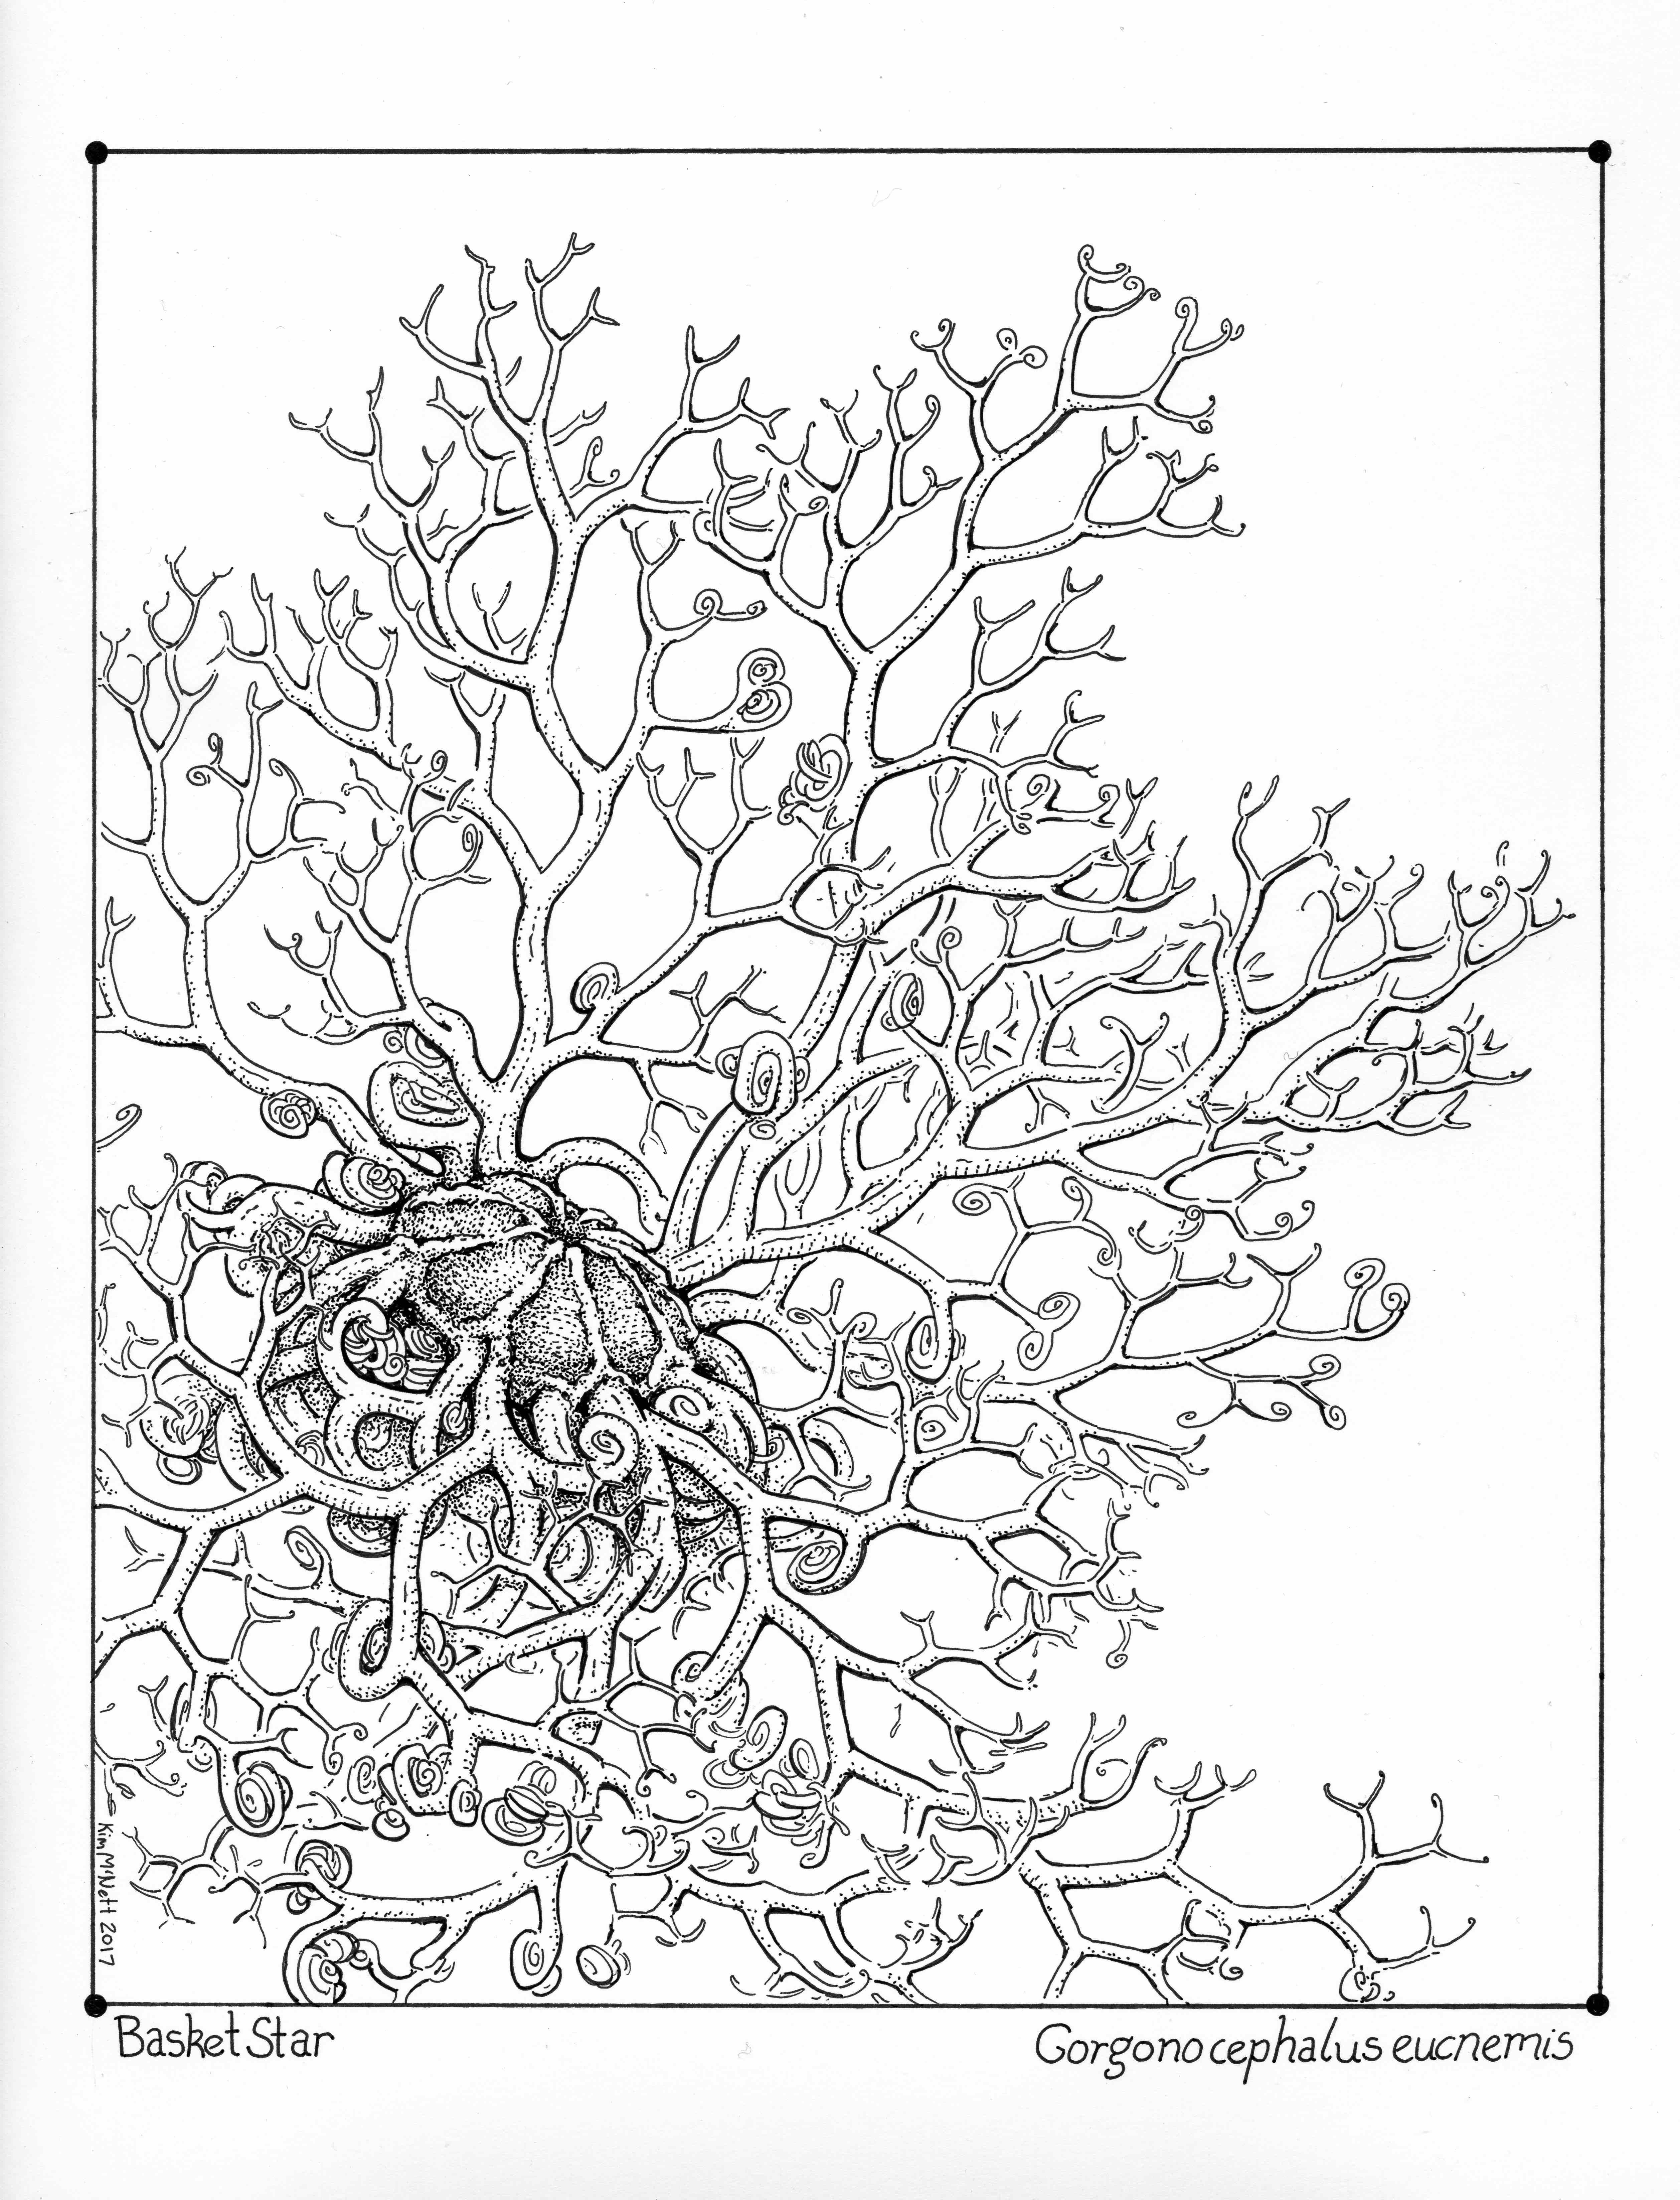 Basket Star Gorgonocephalus eucnemis drawing